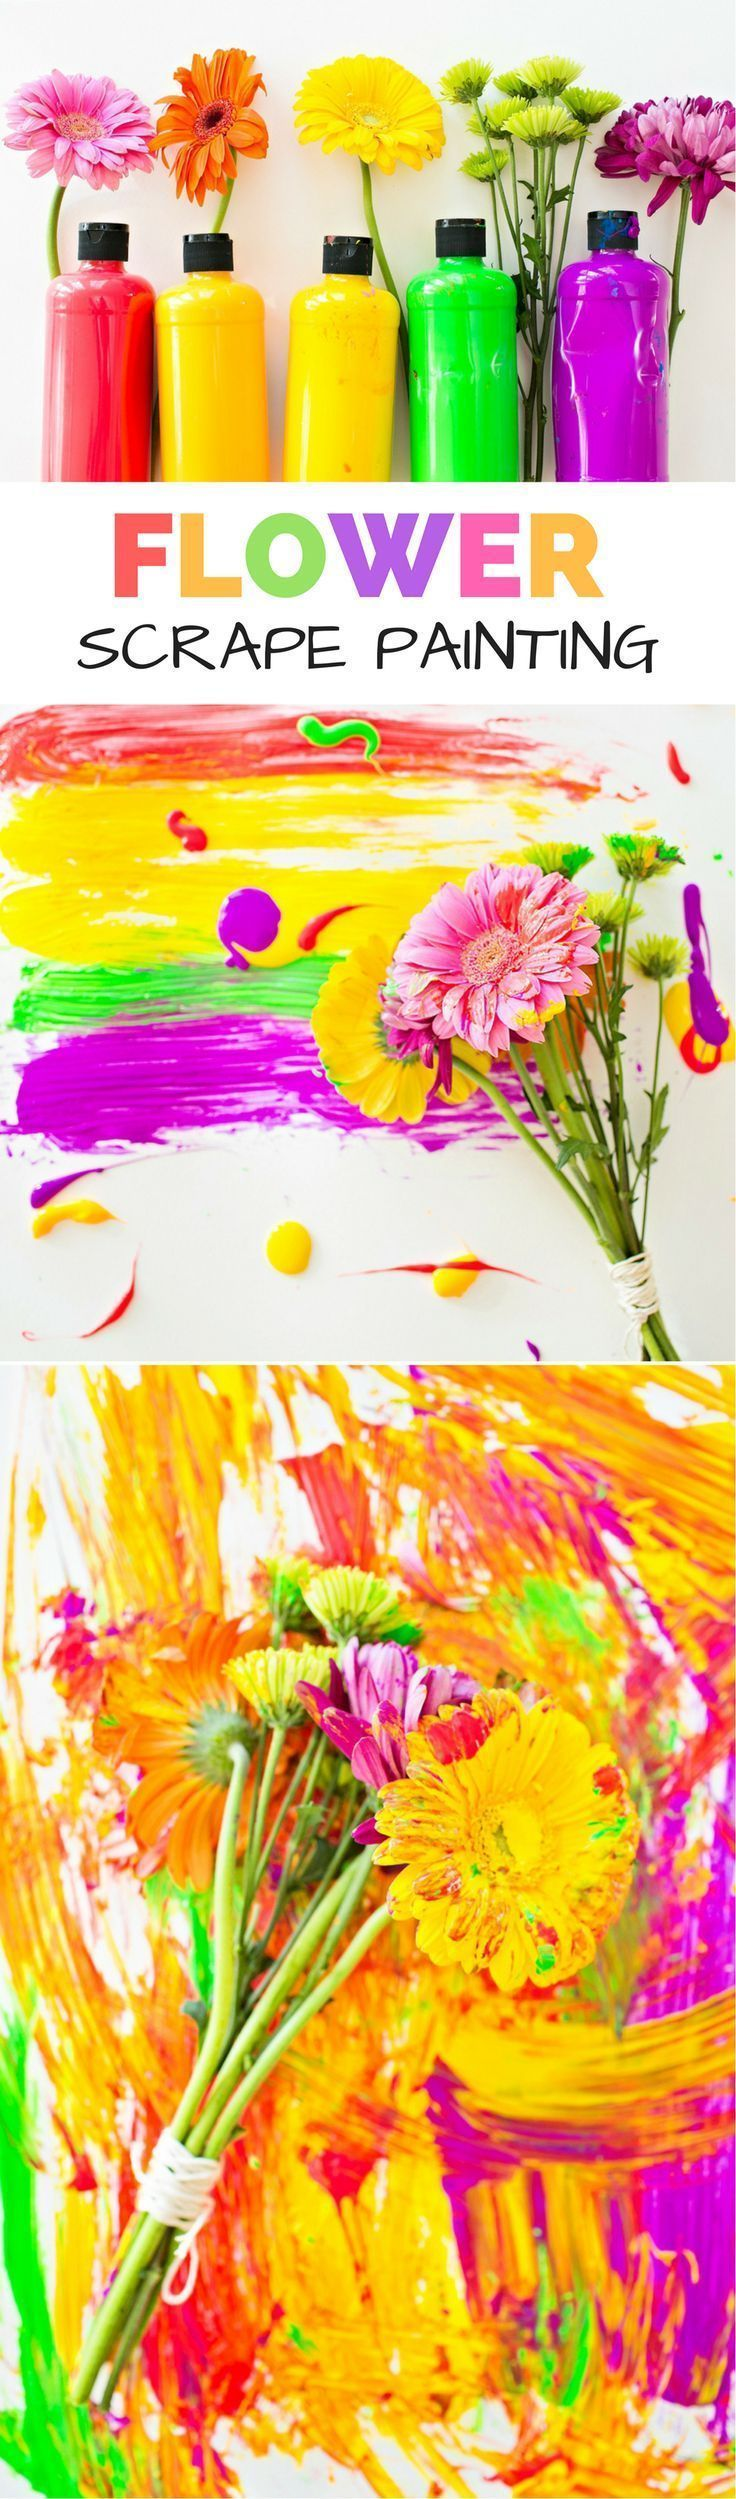 Flower Scrape Painting With Kids Kids Art Ideas